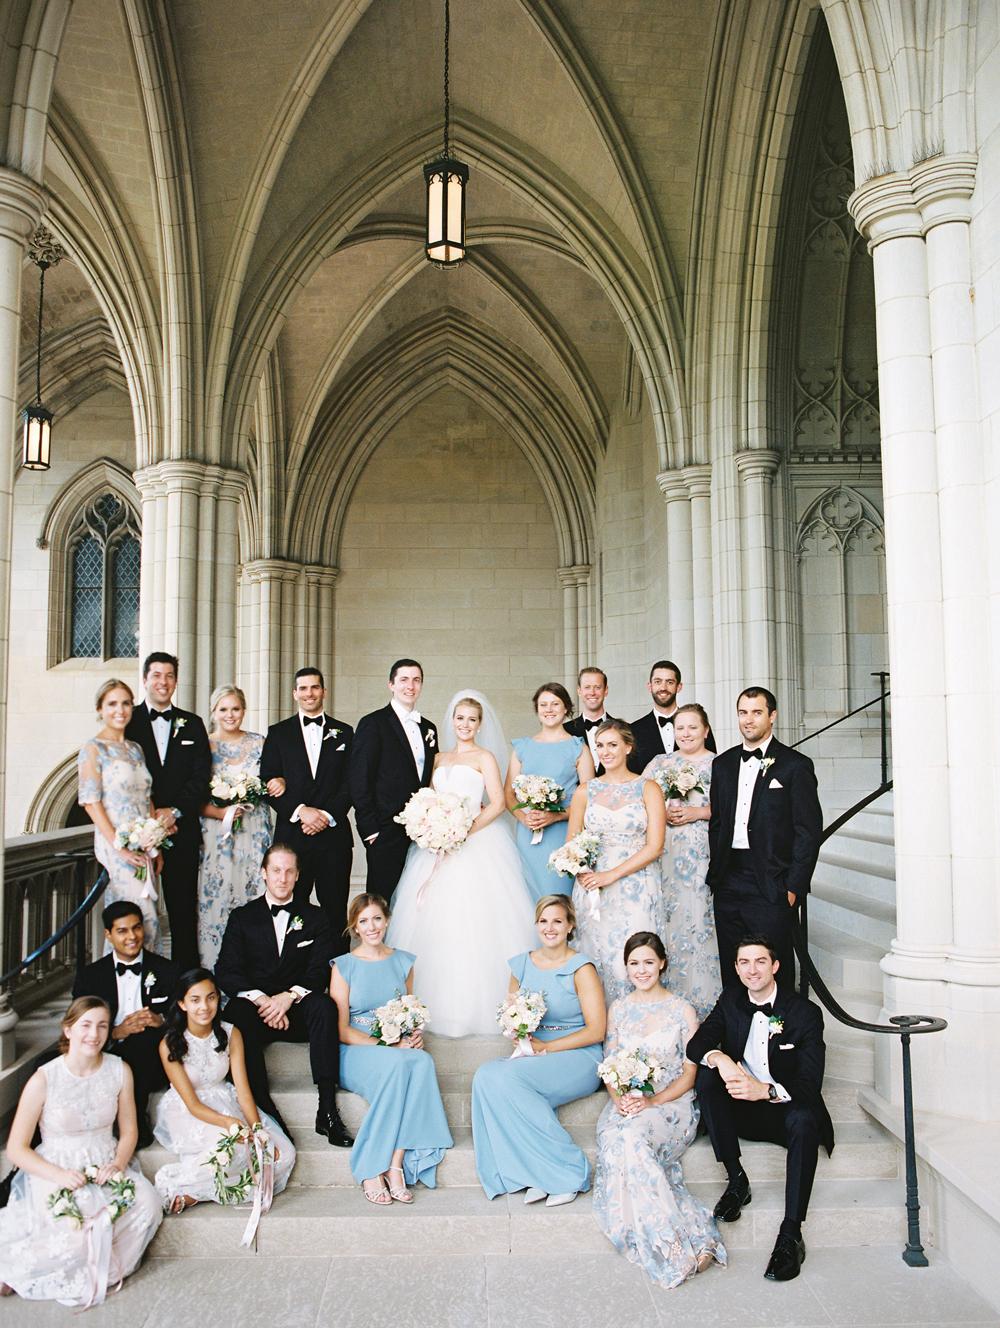 bride and groom with bridal party at wedding venue